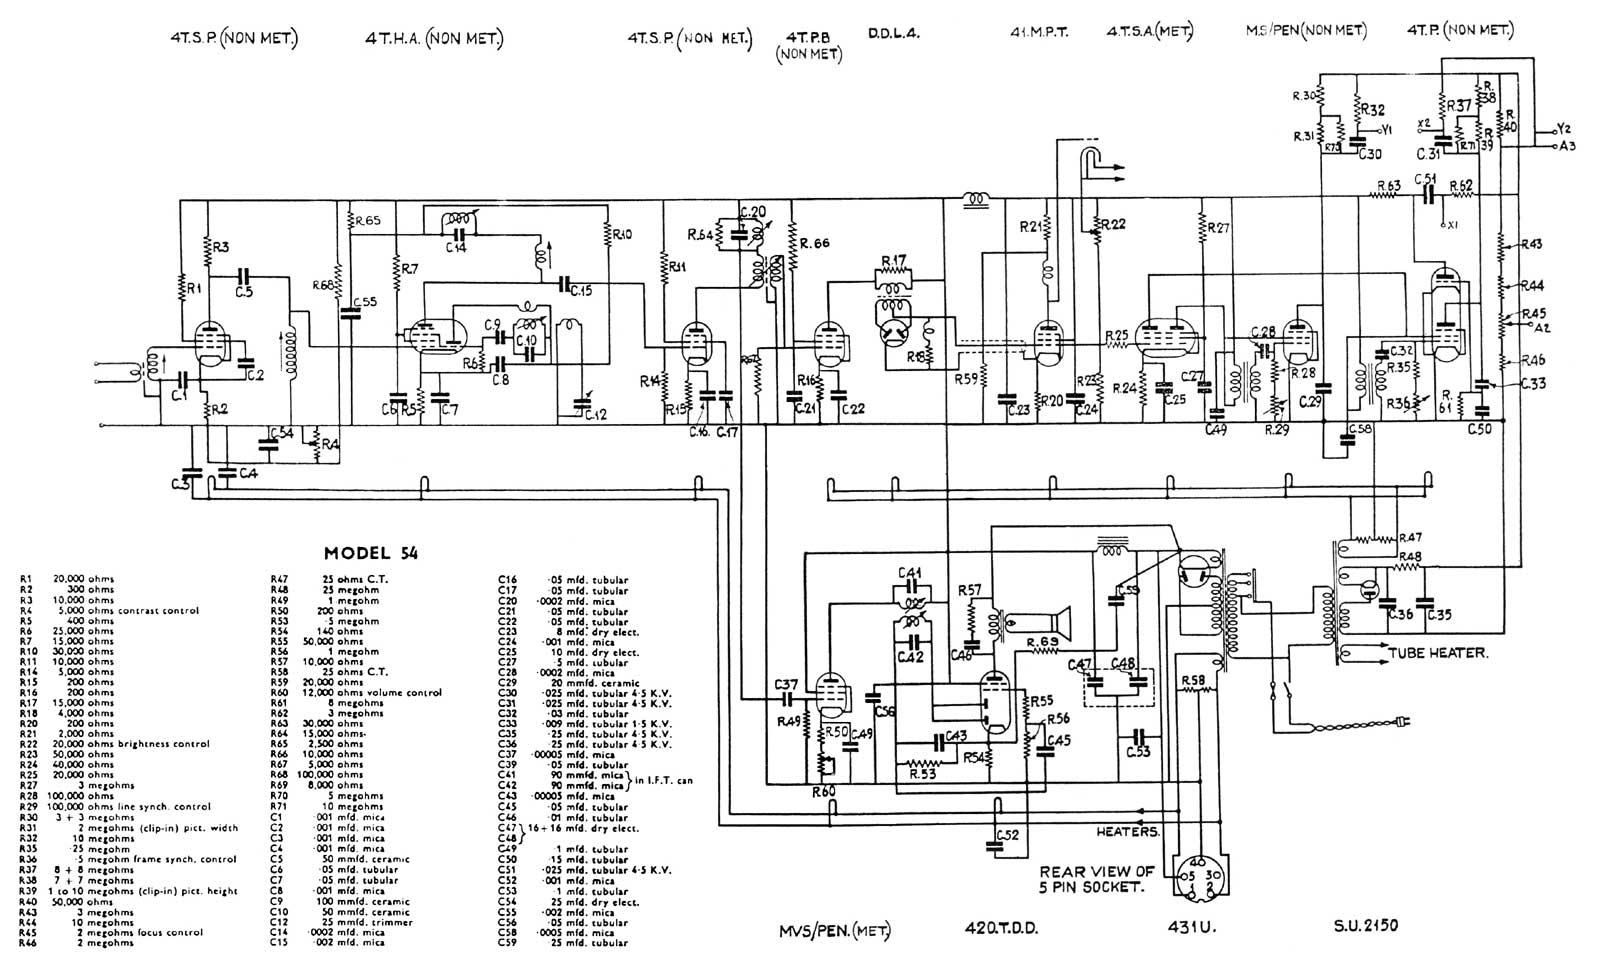 Pleasant Skema Samsung Ln26B350F1 Ln32B350F1 Tft Lcd Tv Circuit Diagram Wiring Digital Resources Anistprontobusorg